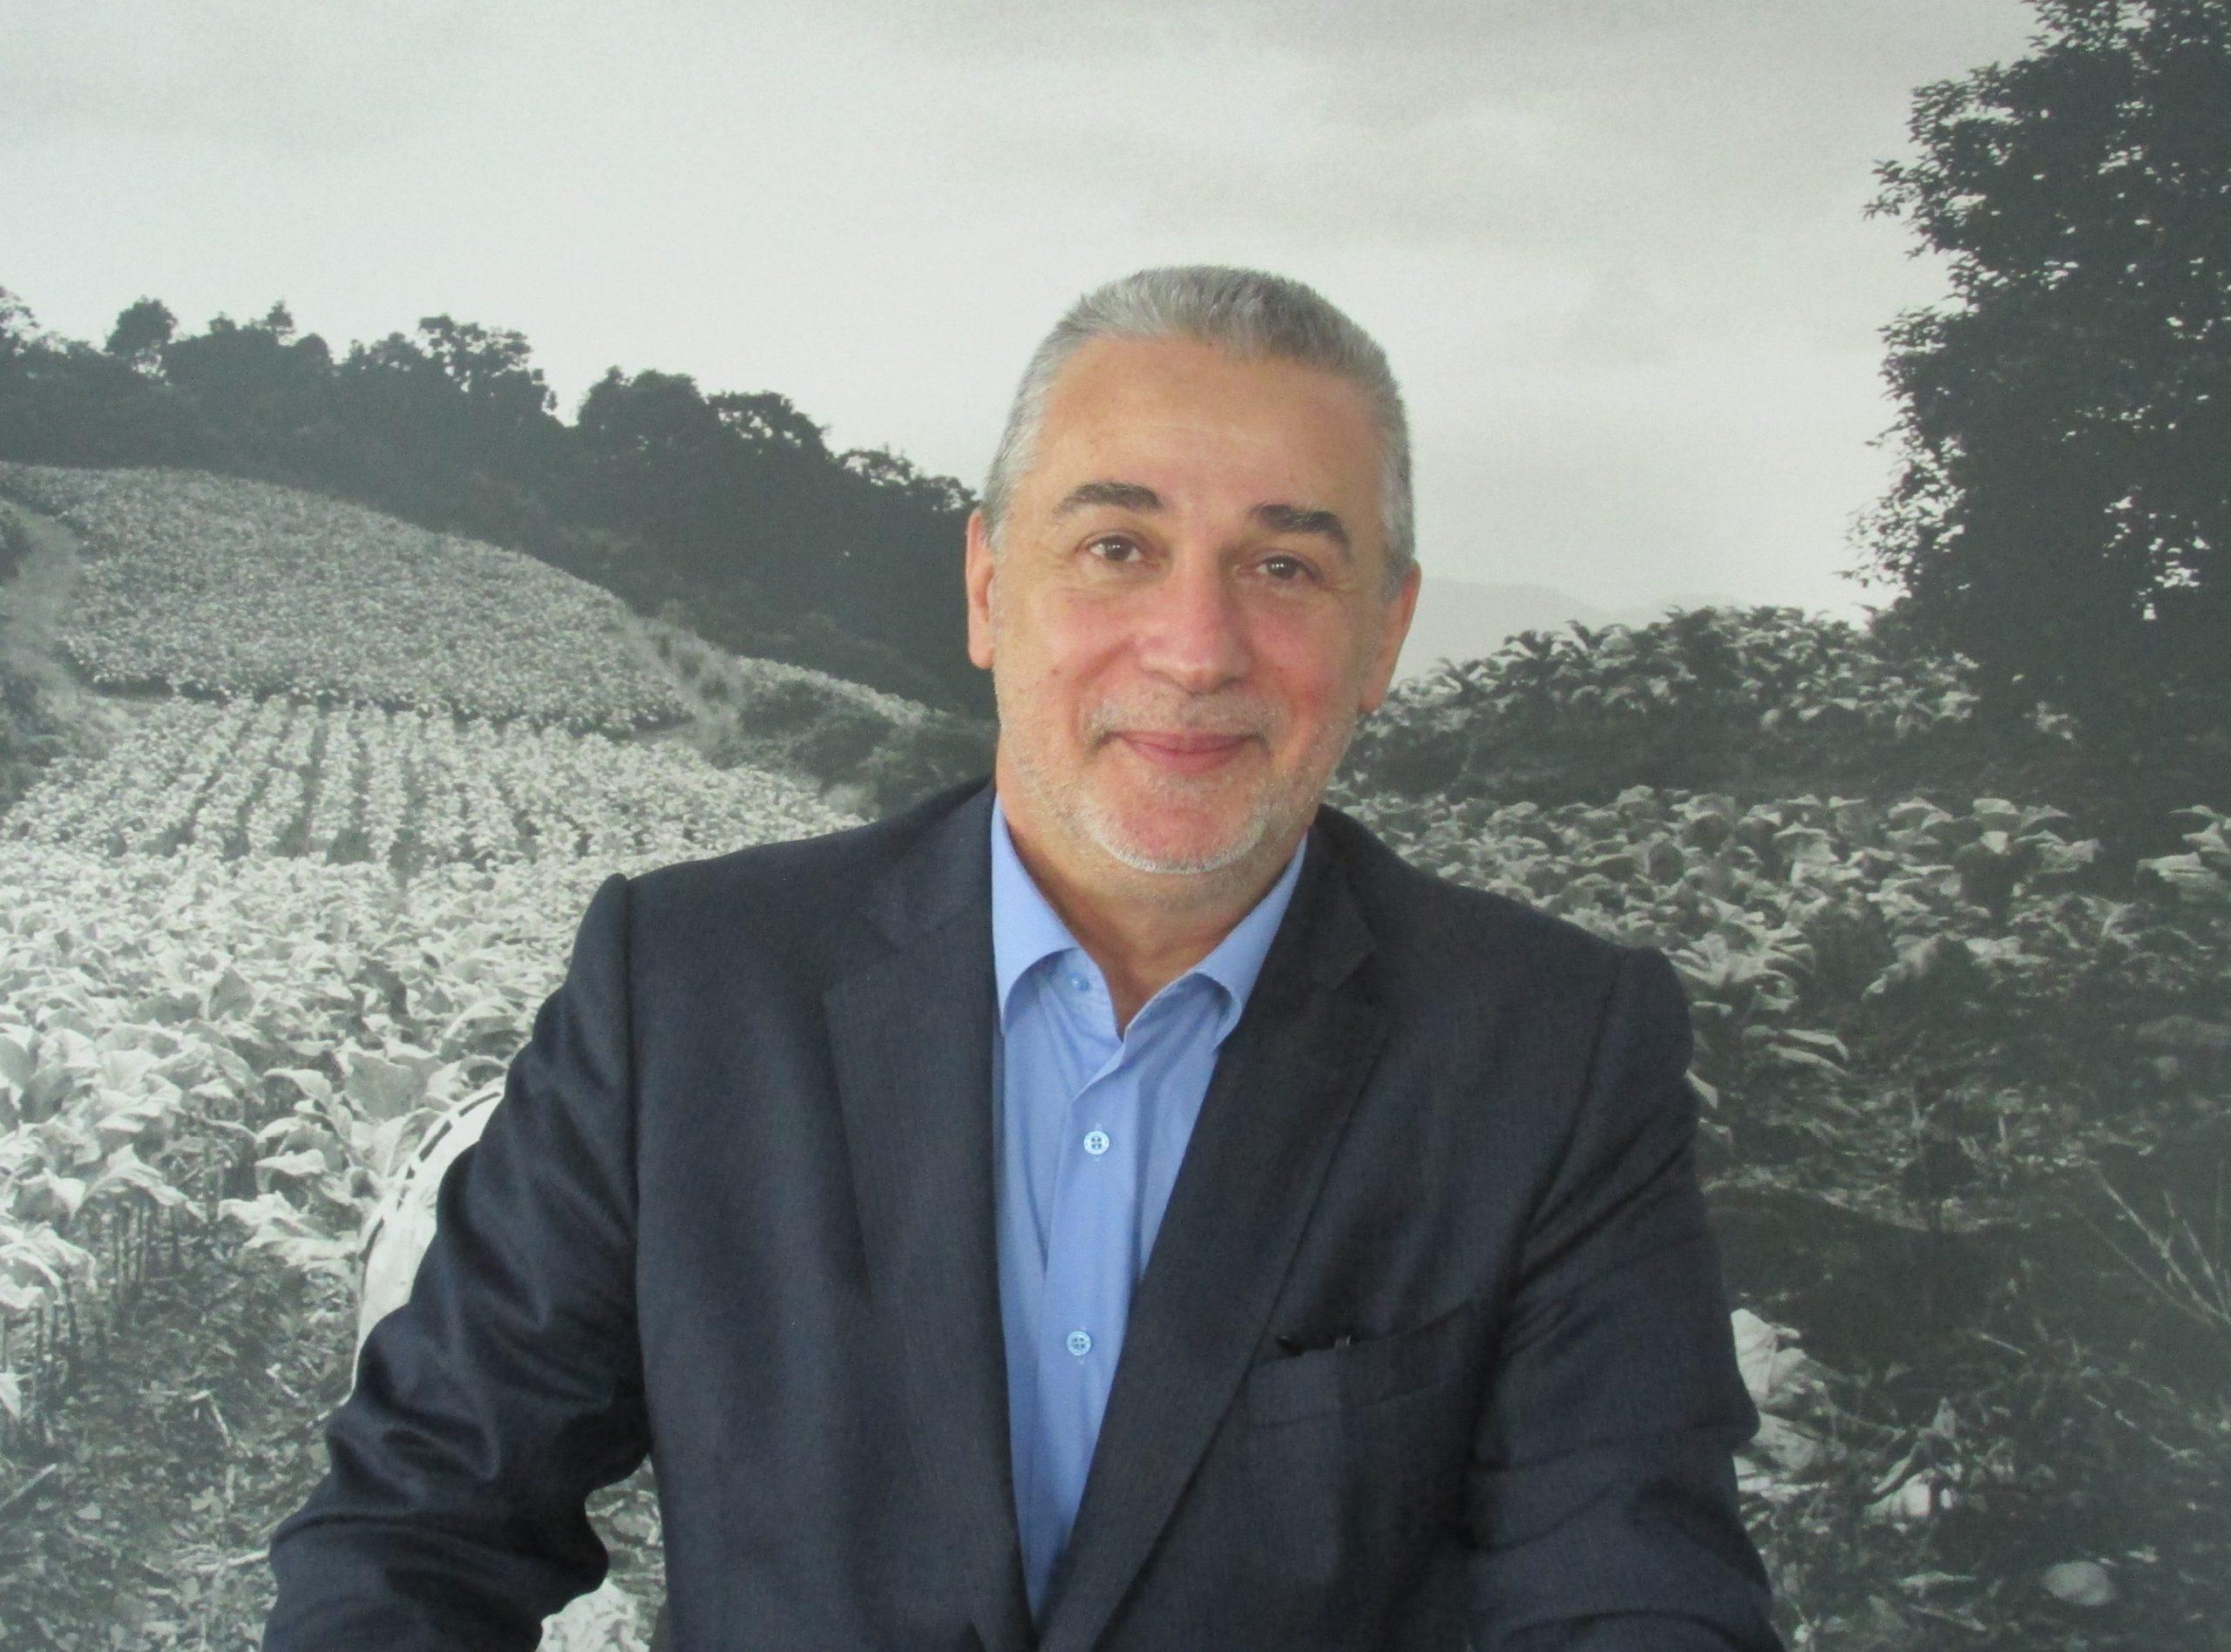 President of the board of JBBA - Vladislav Mihov